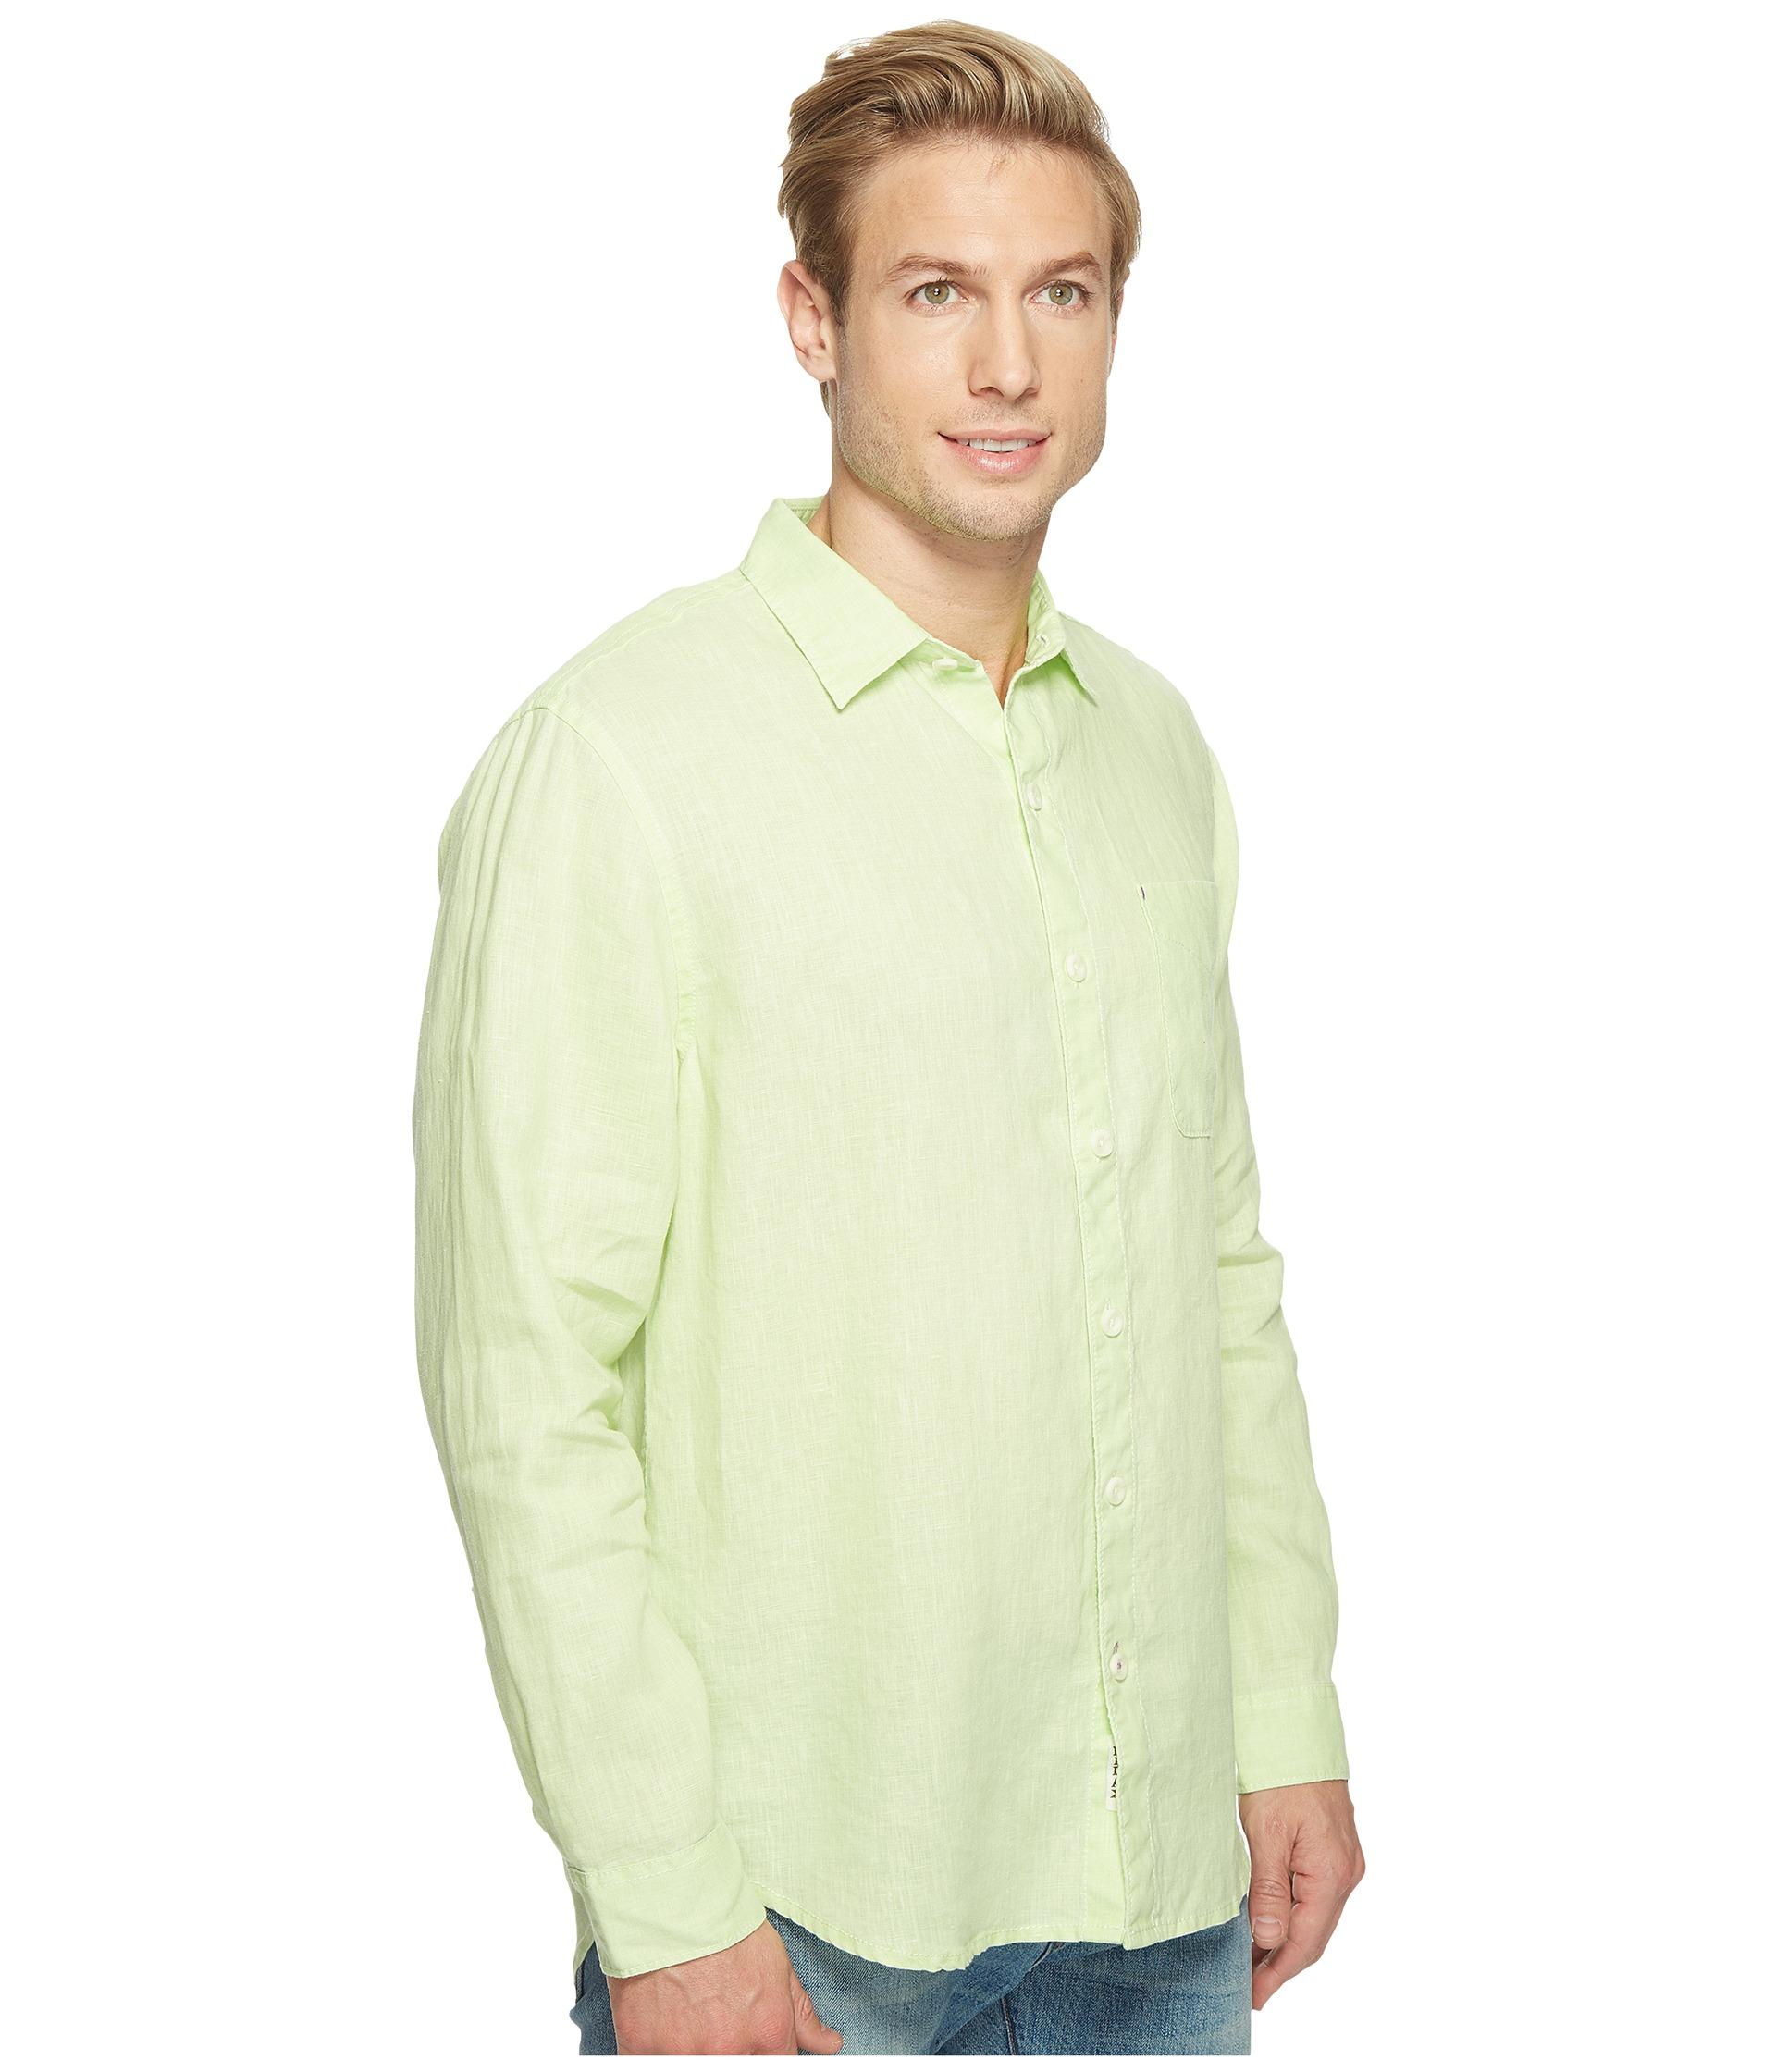 Tommy bahama sea glass breezer long sleeve shirt at for Tommy bahama long sleeve dress shirts